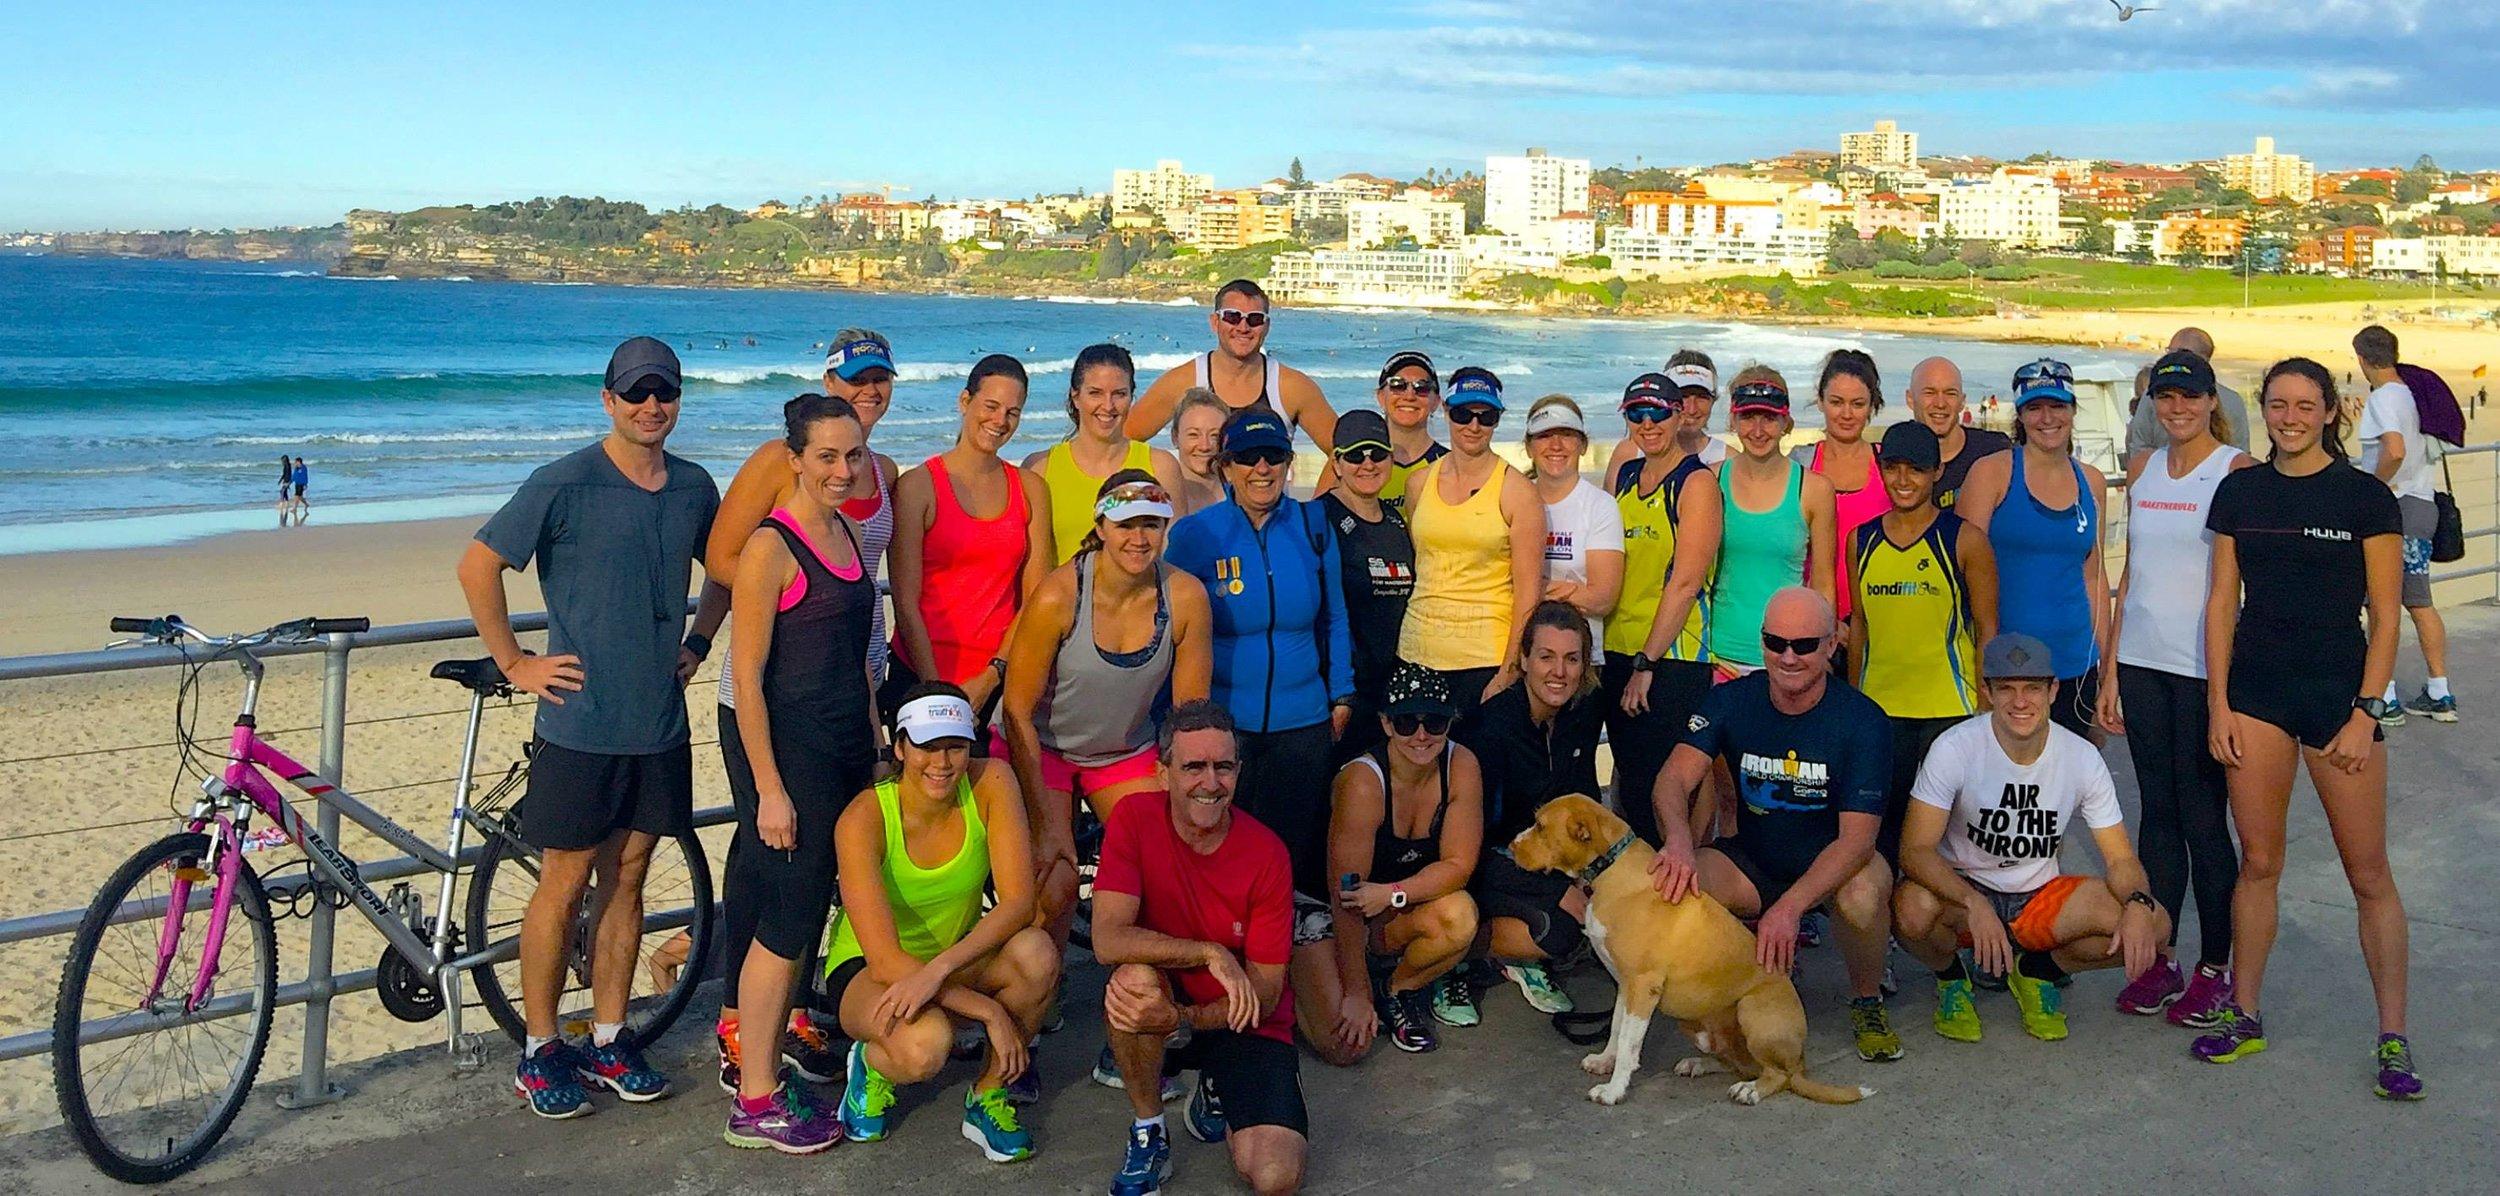 Meet 7:15am for 7:30am start North Bondi Surf Club